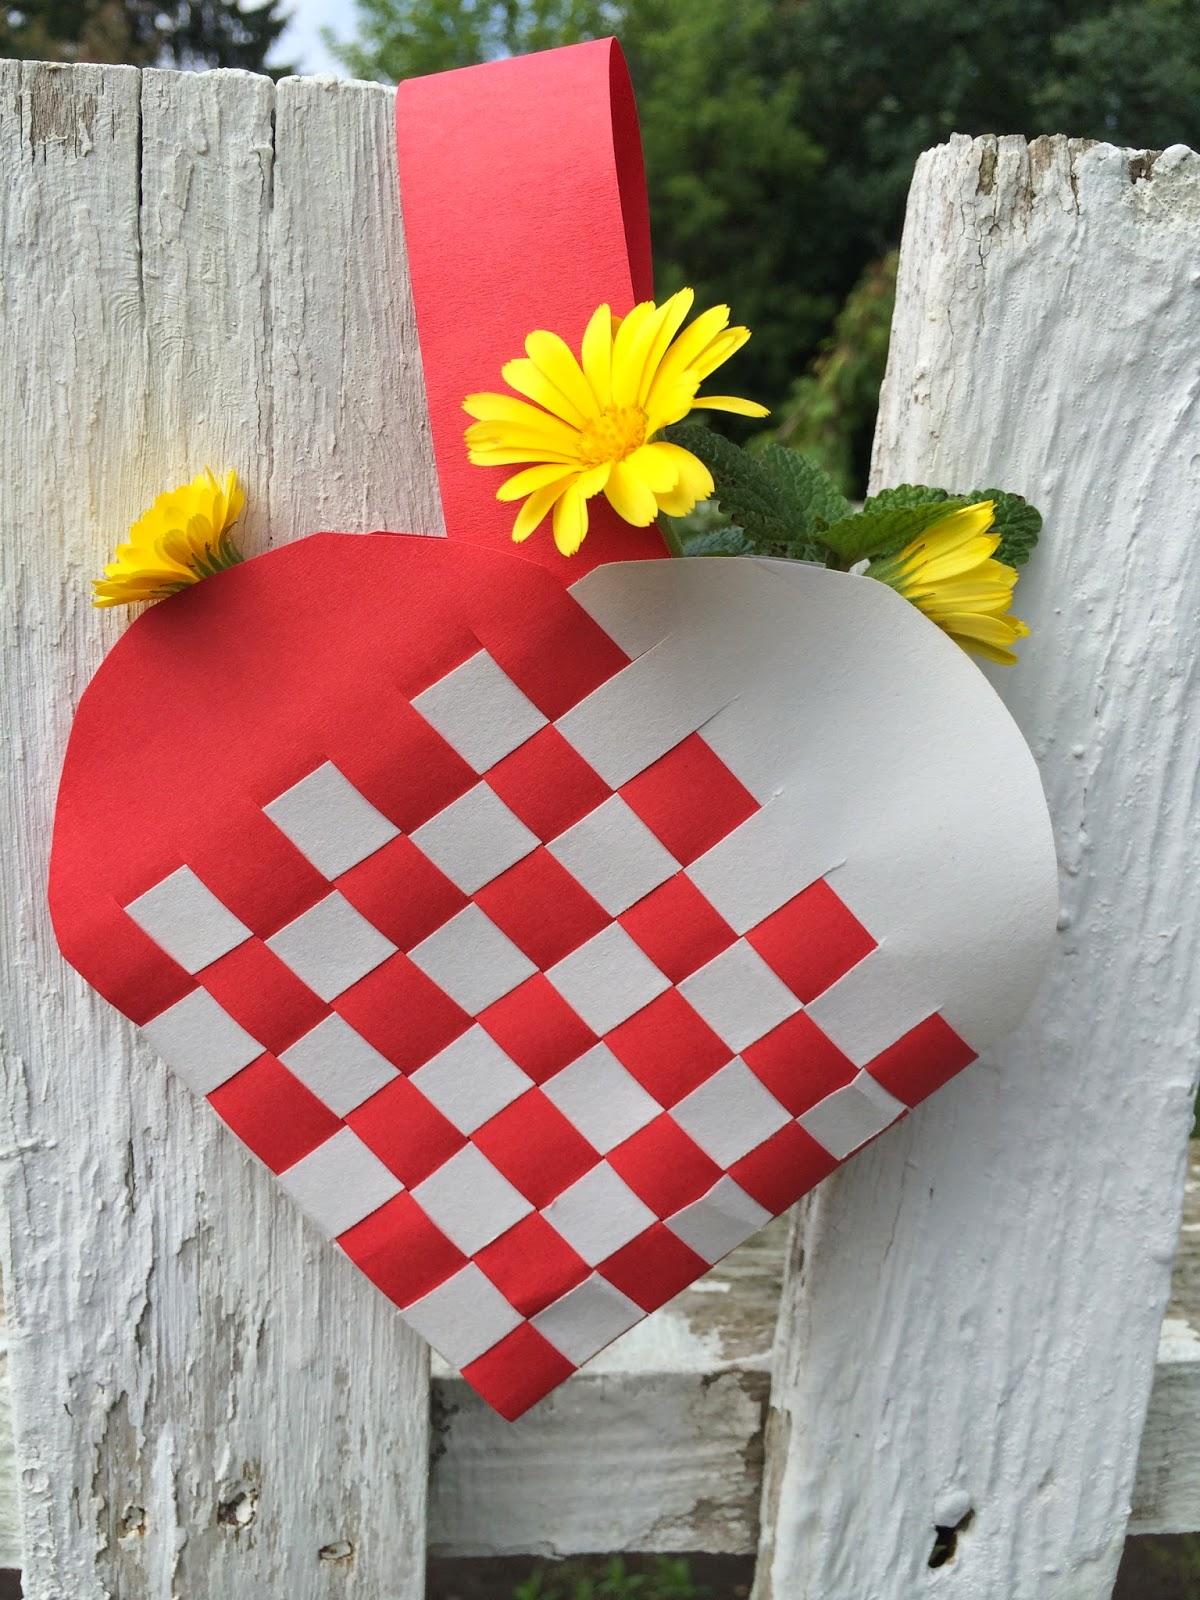 Woven Heart Basket Craft : Heart and hand festival woven basket